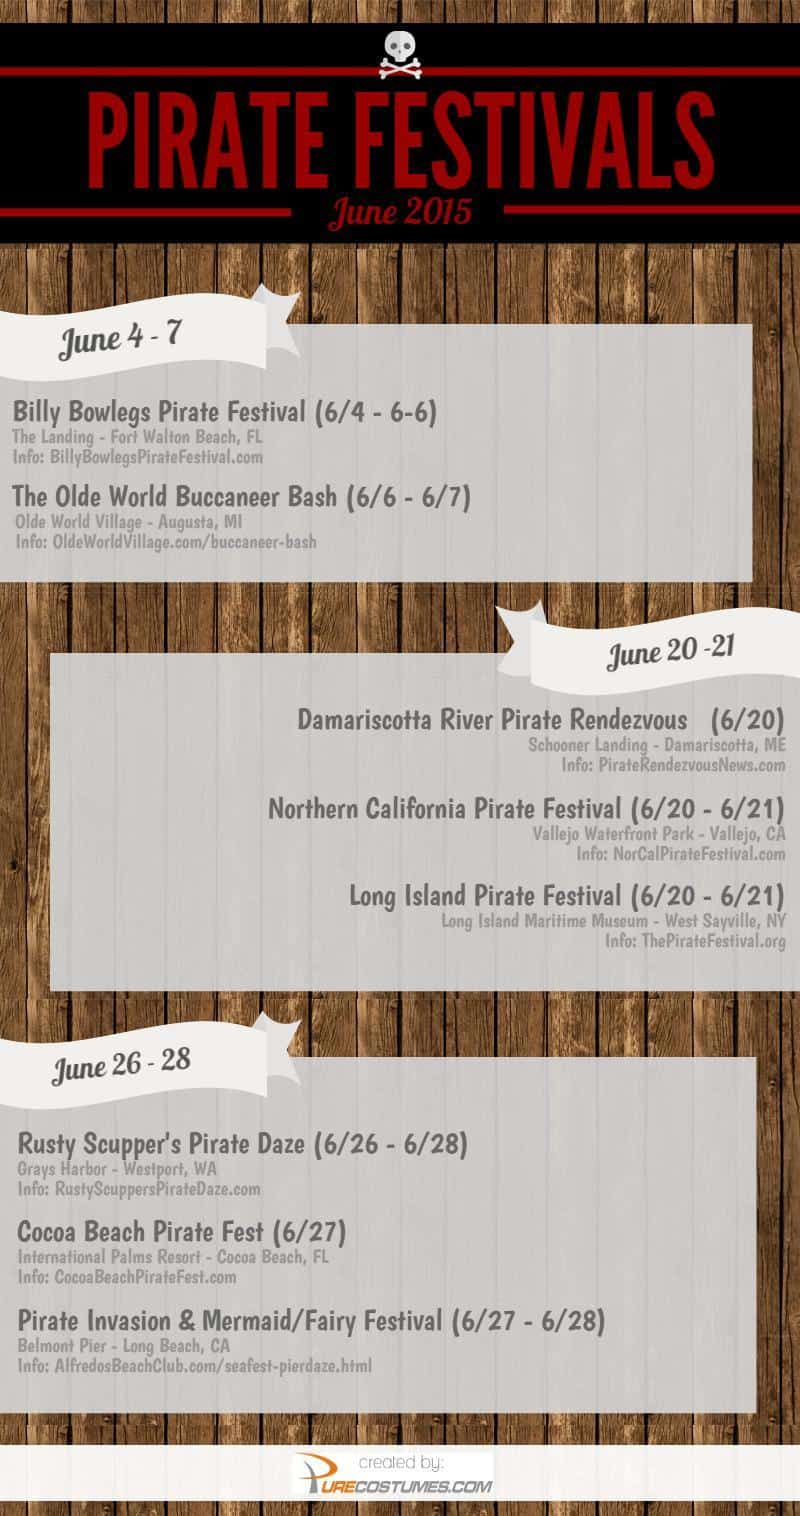 Pirate Events June 2015